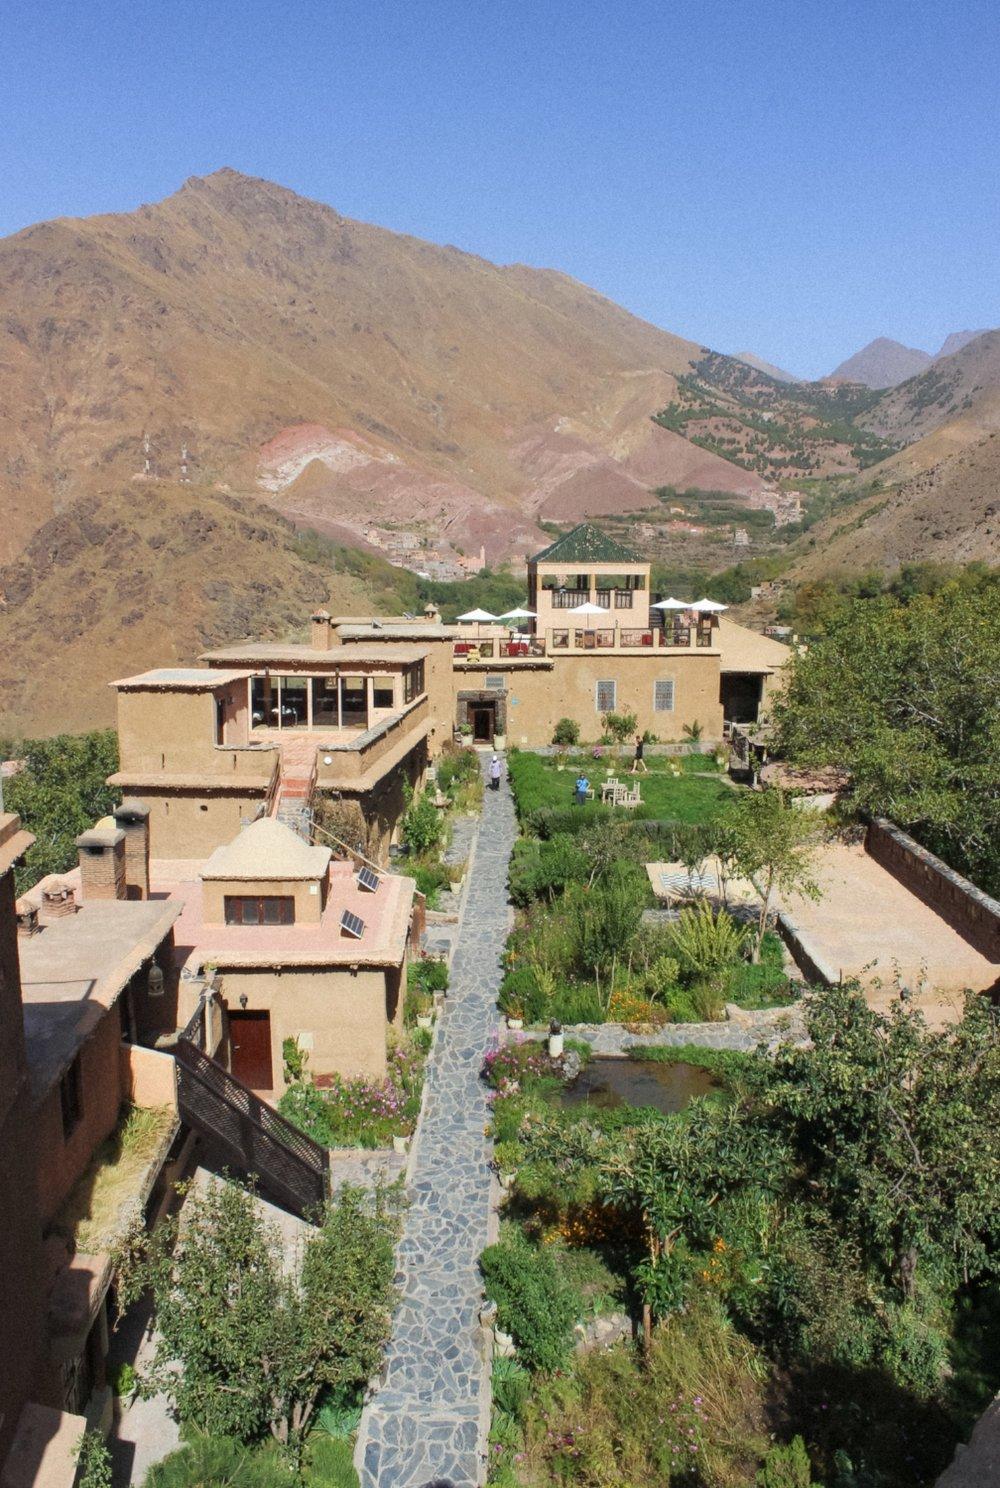 curio.trips.morocco.high.atlas.mountains.hotel.view.jpg